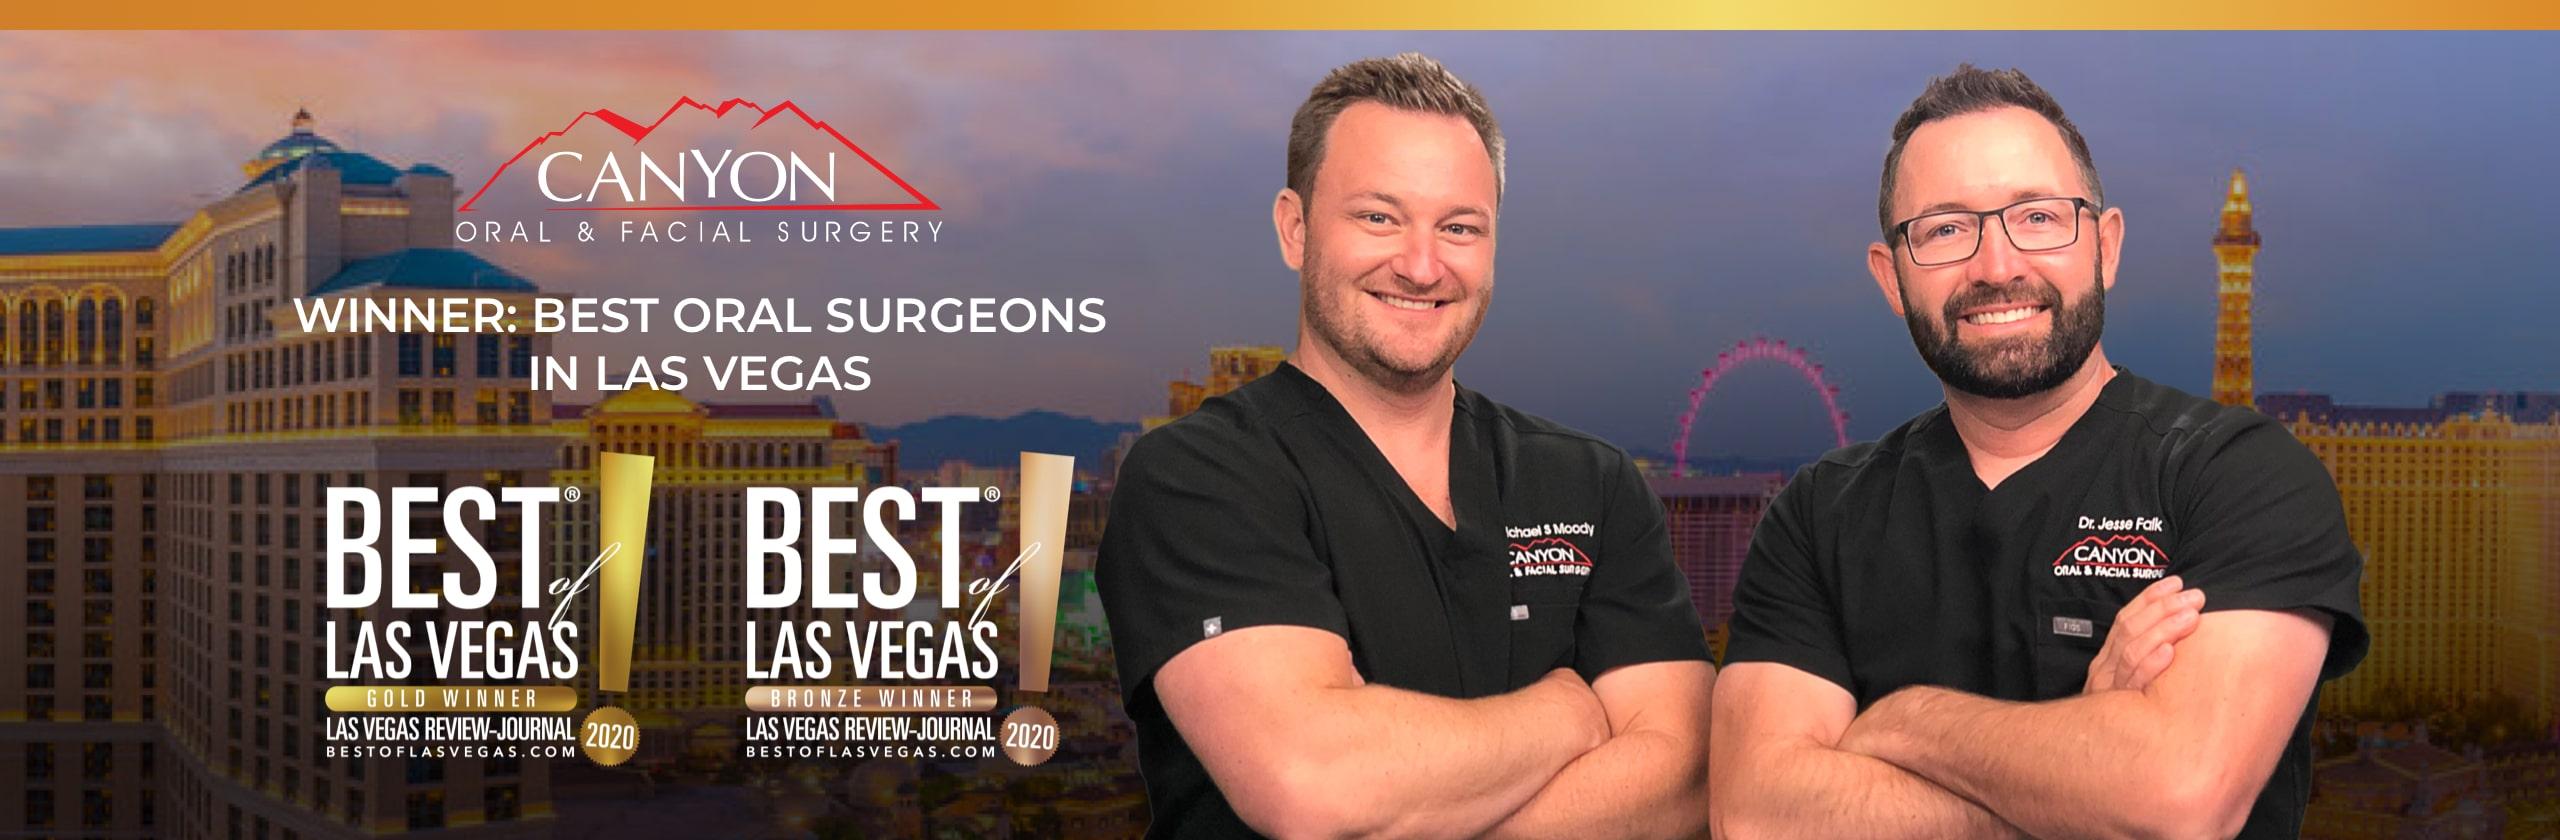 Best oral surgeon in las vegas nv. Oral surgeon winner